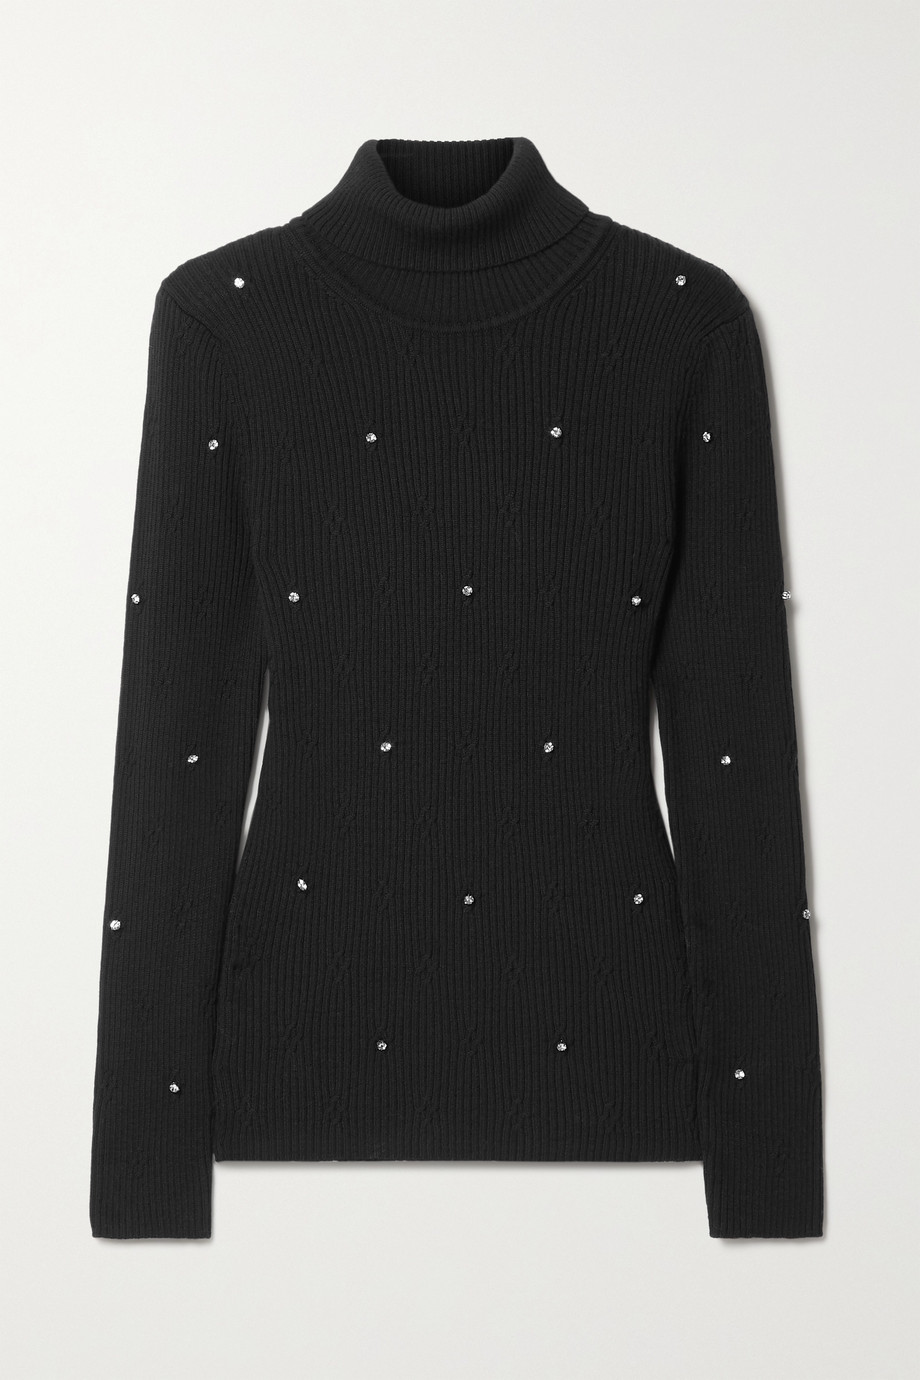 Christopher Kane Crystal-embellished ribbed merino wool turtleneck sweater